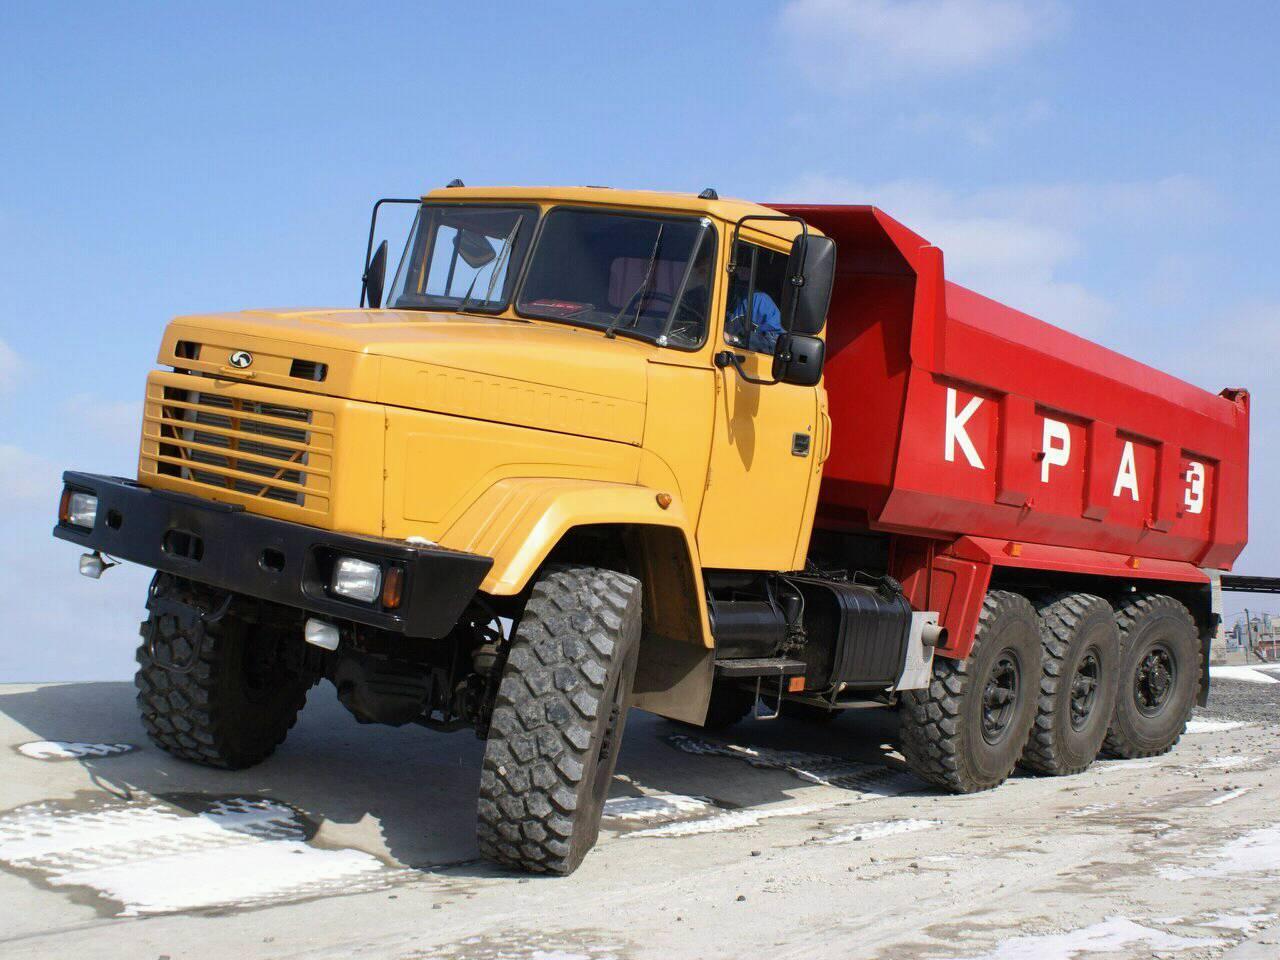 Kraz-3